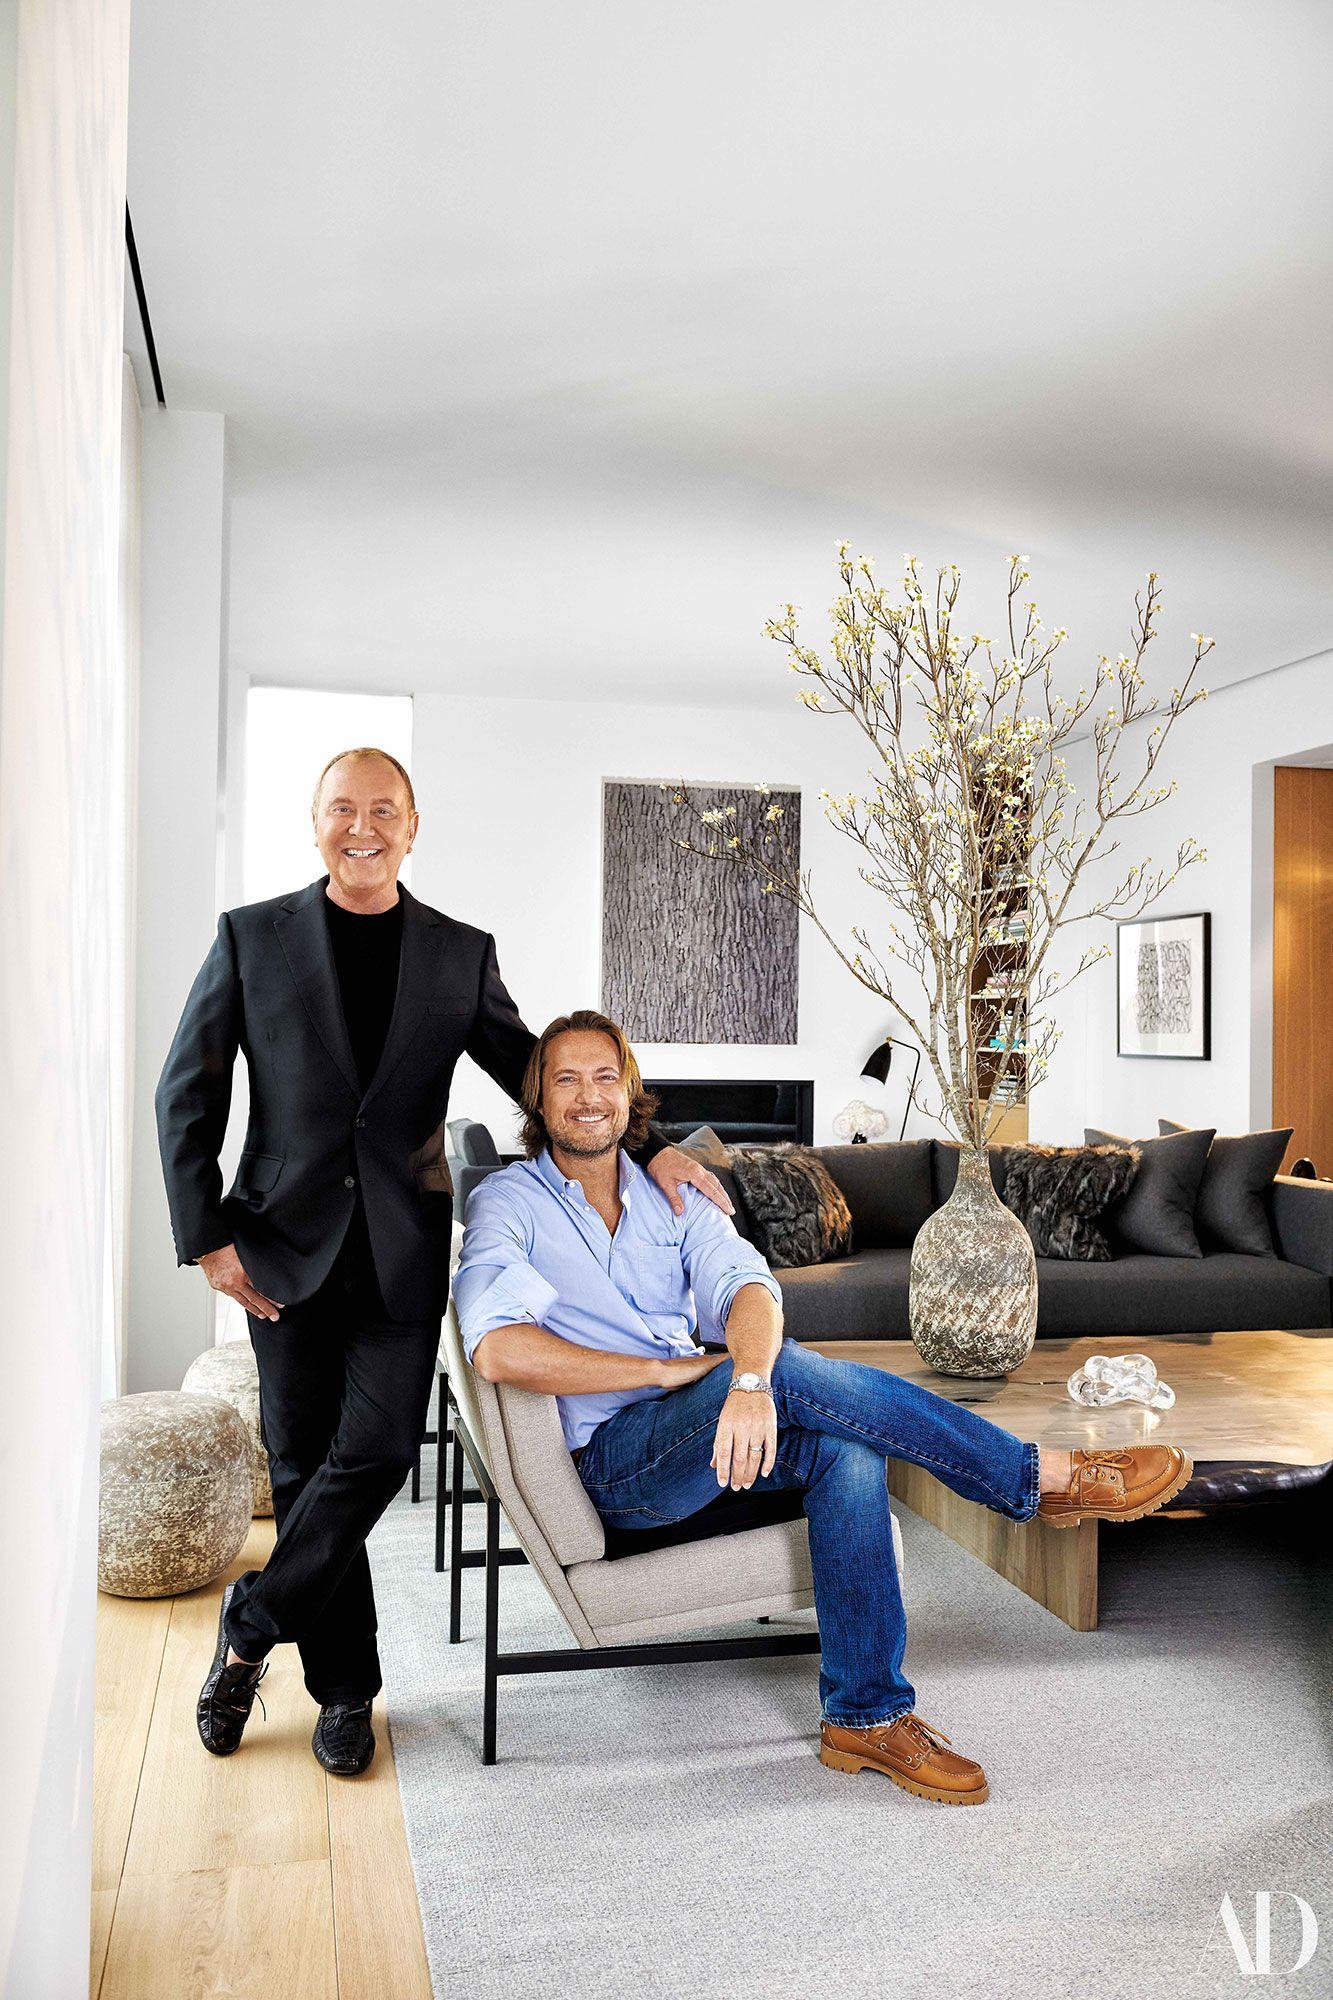 Michael kors architectural digest 1 greenwich village living room goals